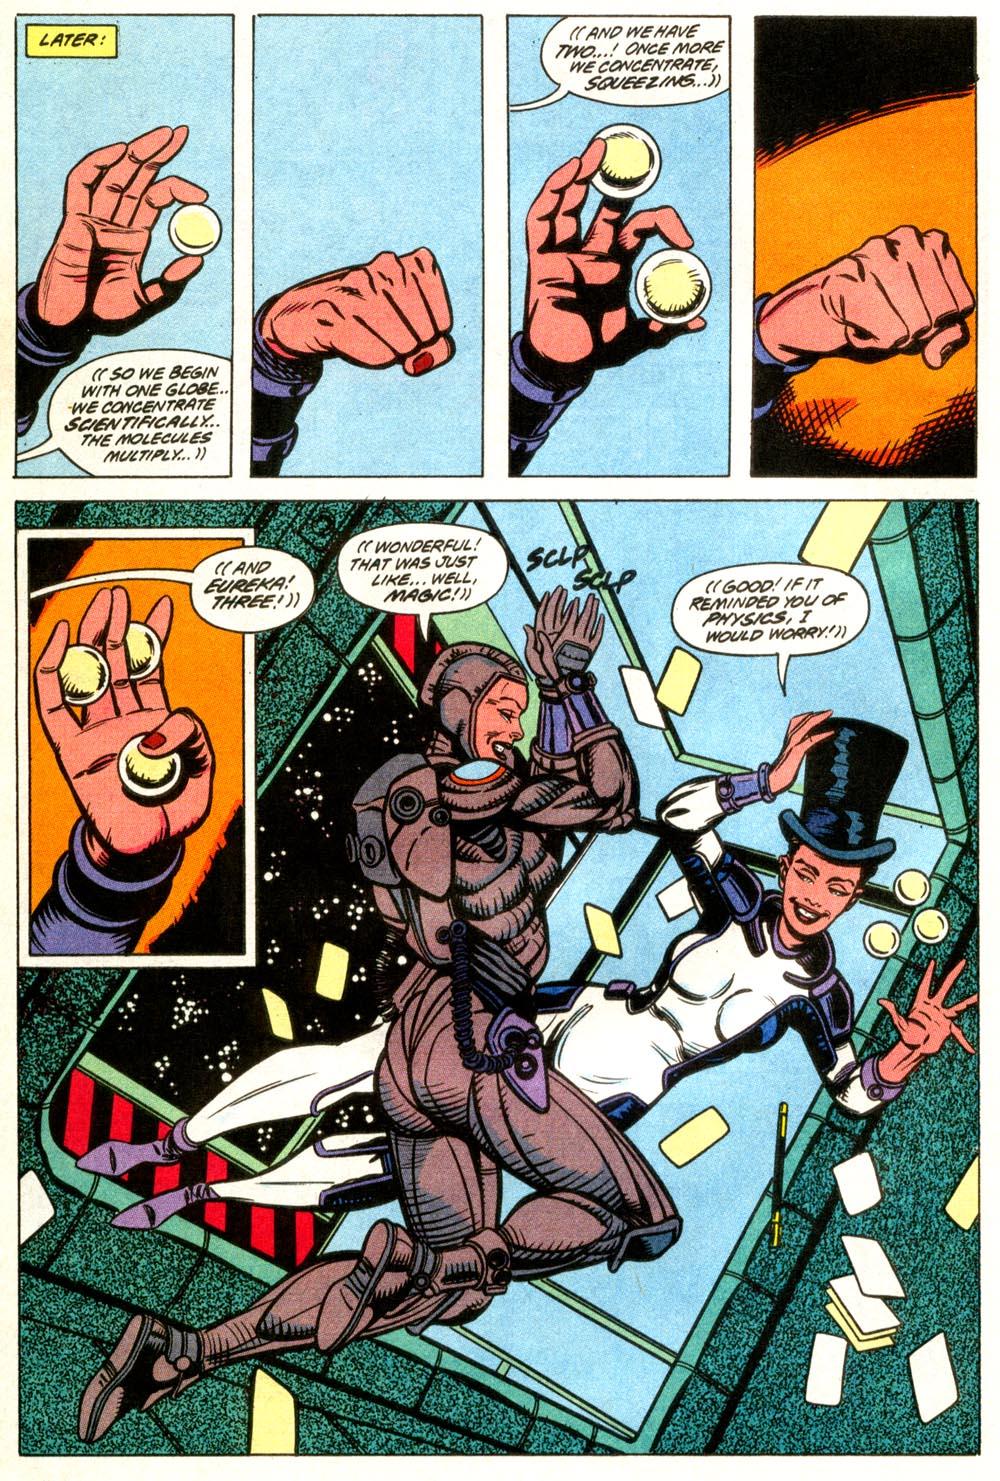 Read online Wonder Woman (1987) comic -  Issue #66 - 13